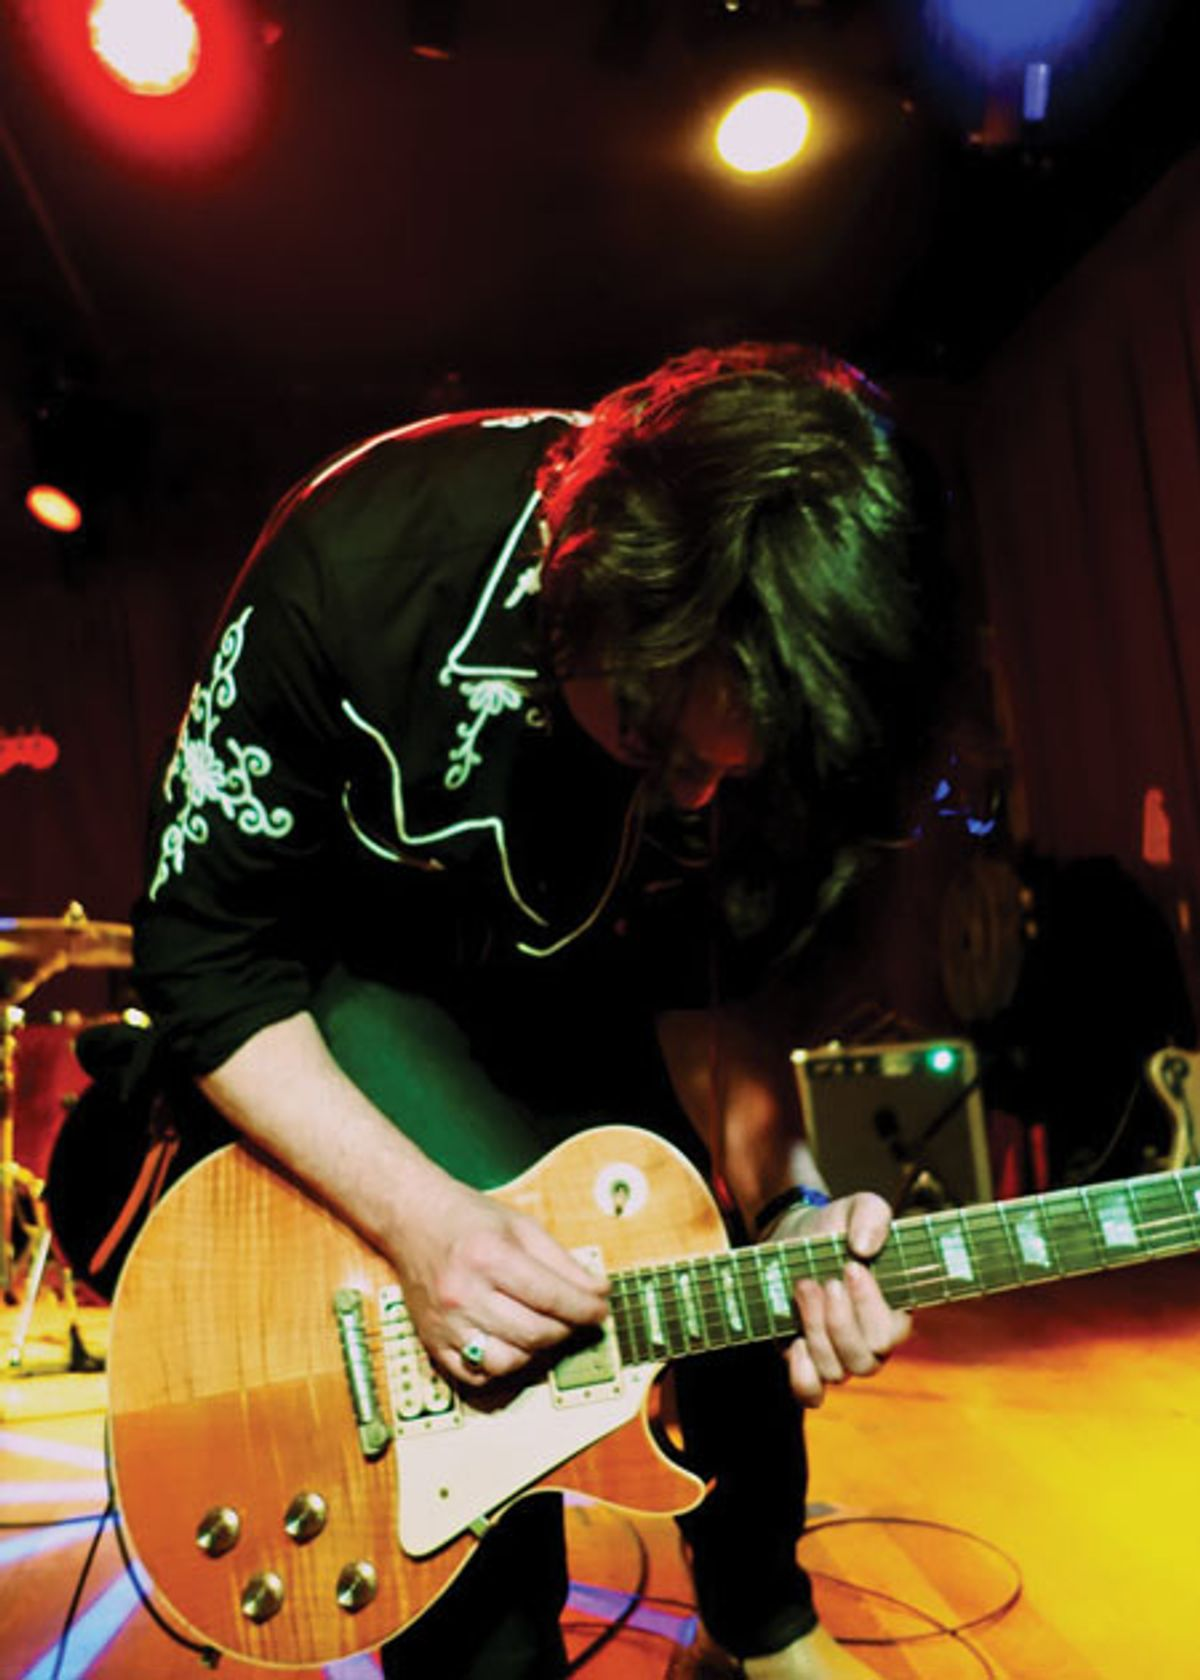 The Codependent Guitarist: The Art of Being a Sideman